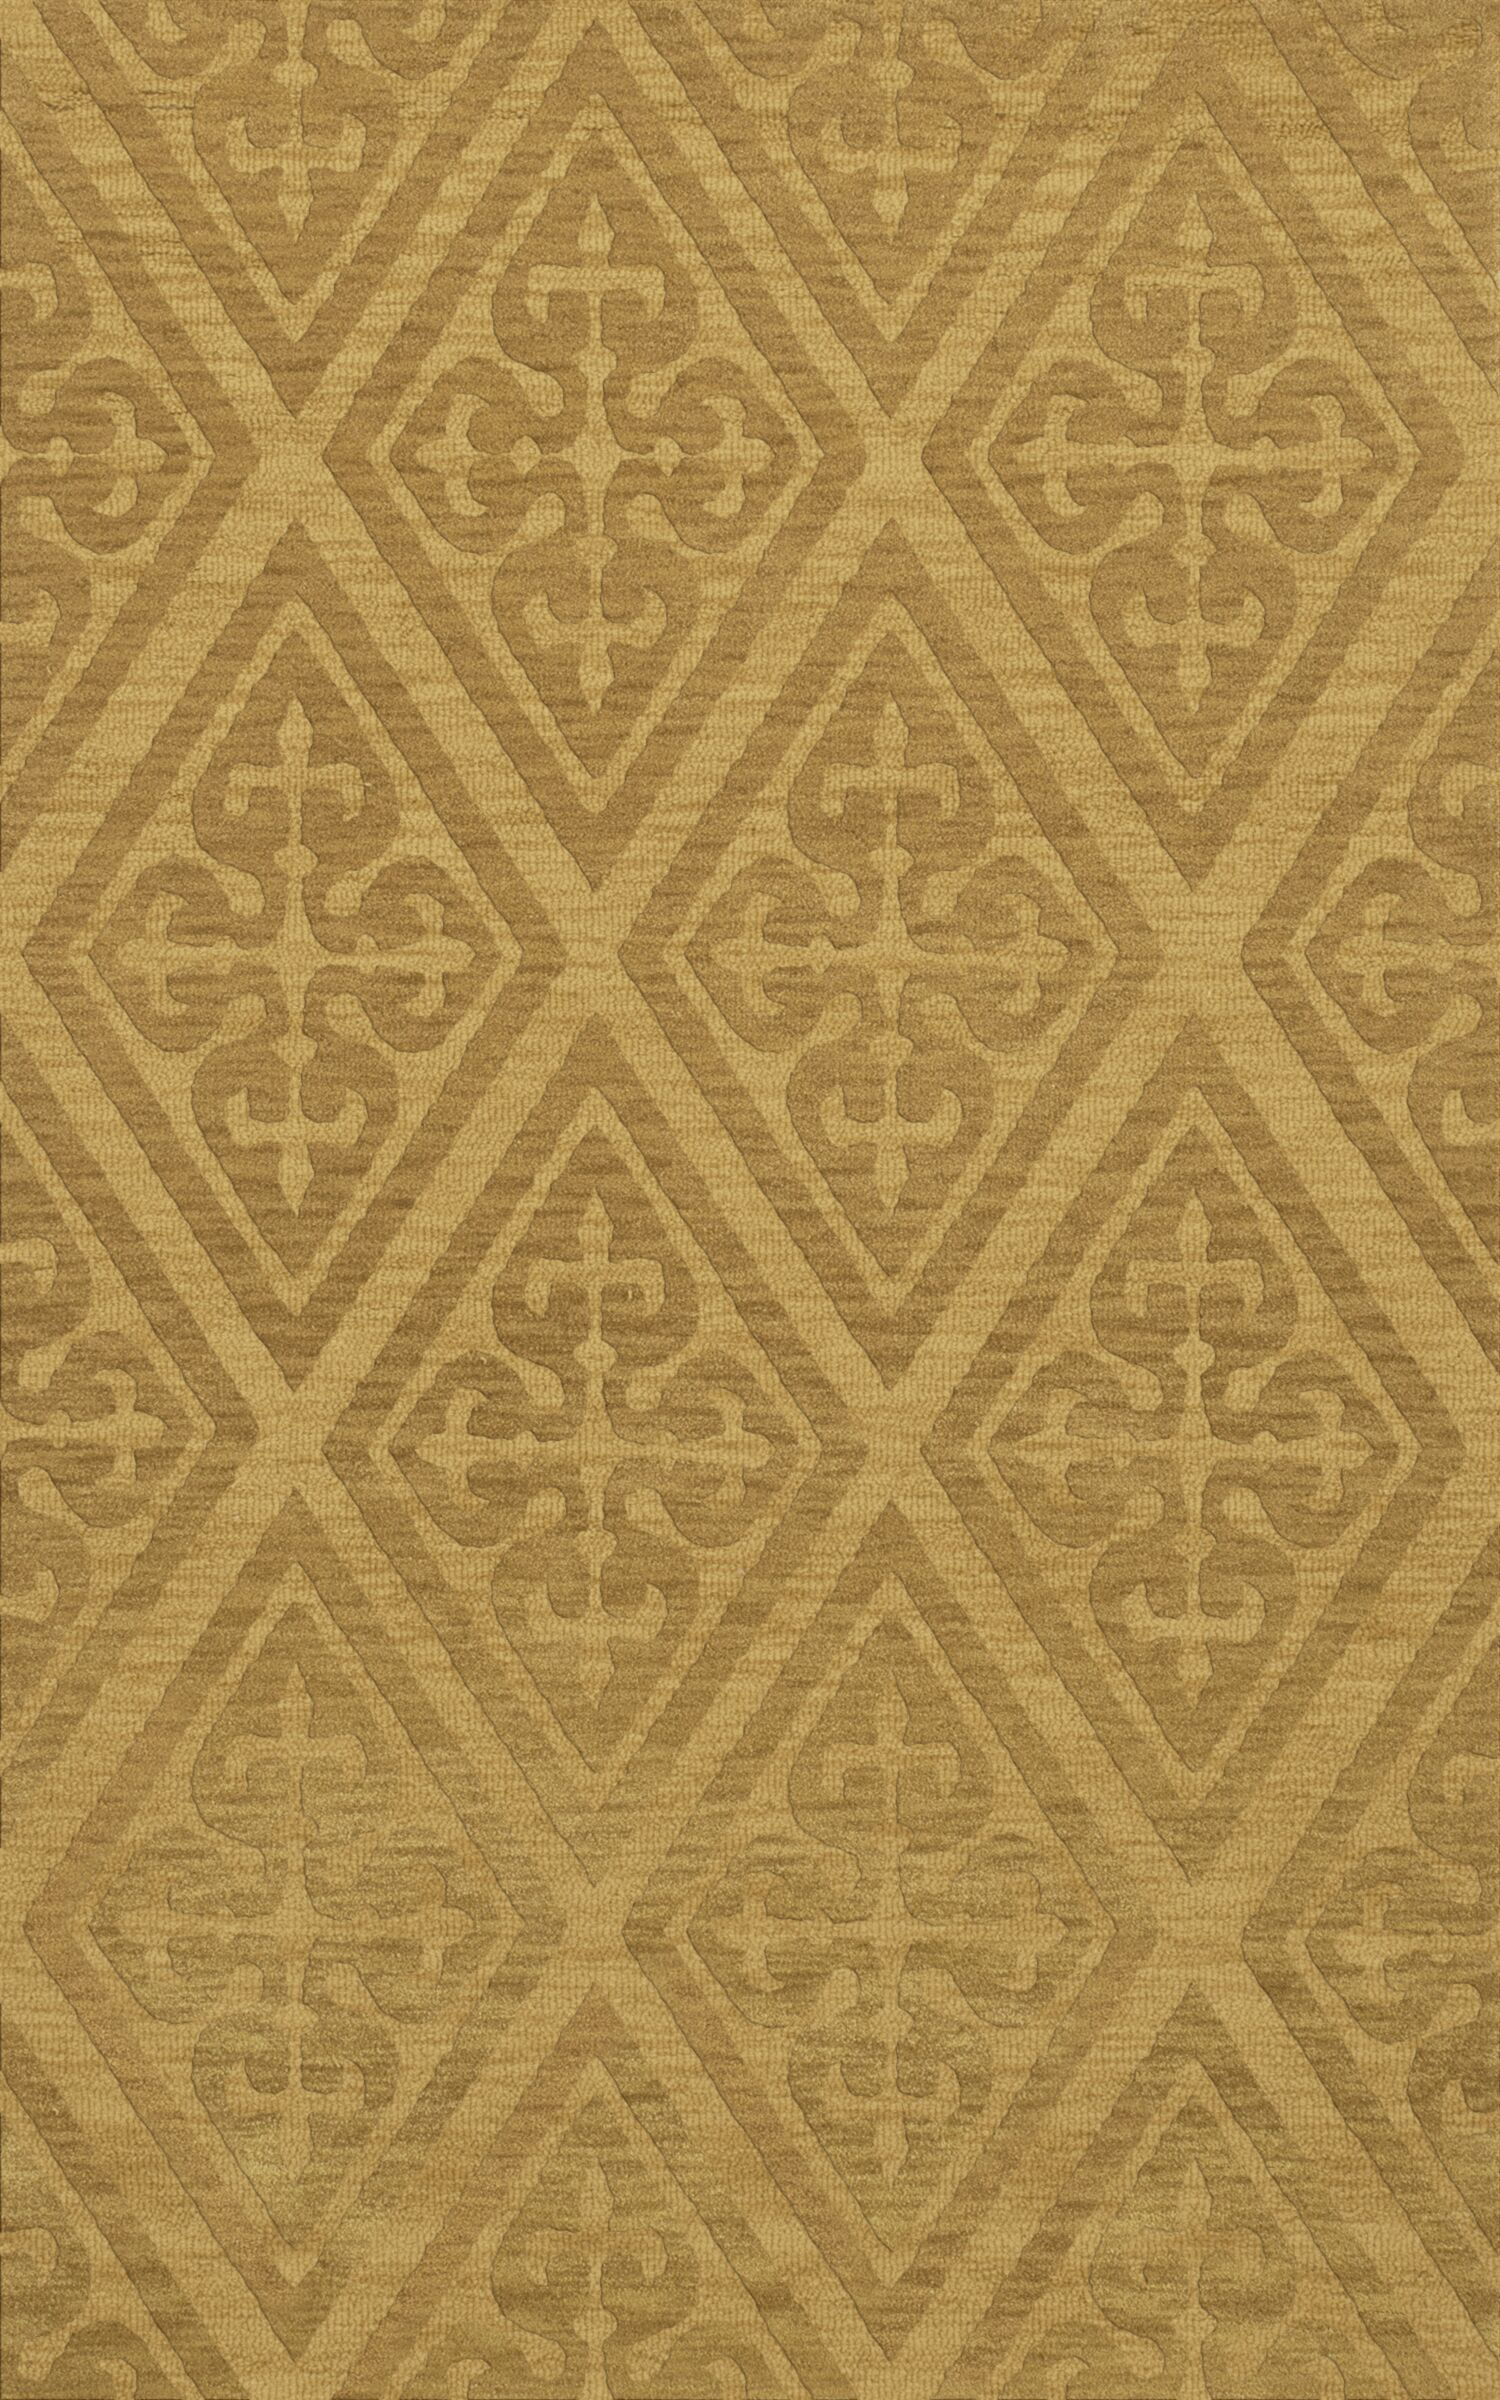 Bella Machine Woven Wool Beige Area Rug Rug Size: Rectangle 12' x 15'